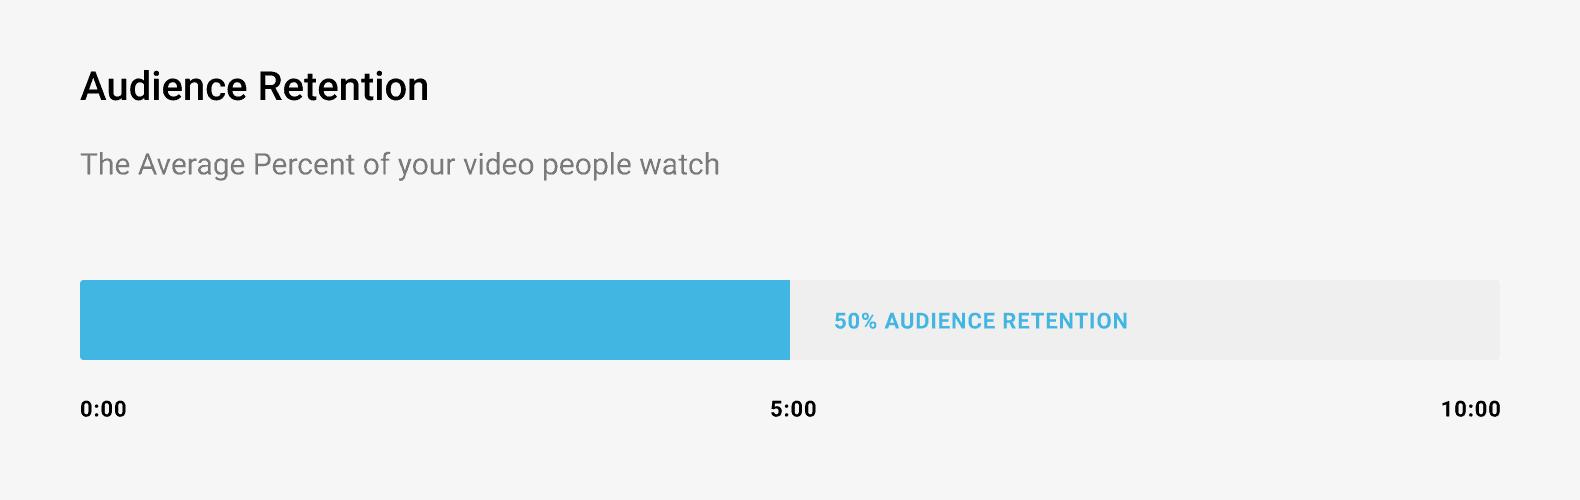 Audience retention